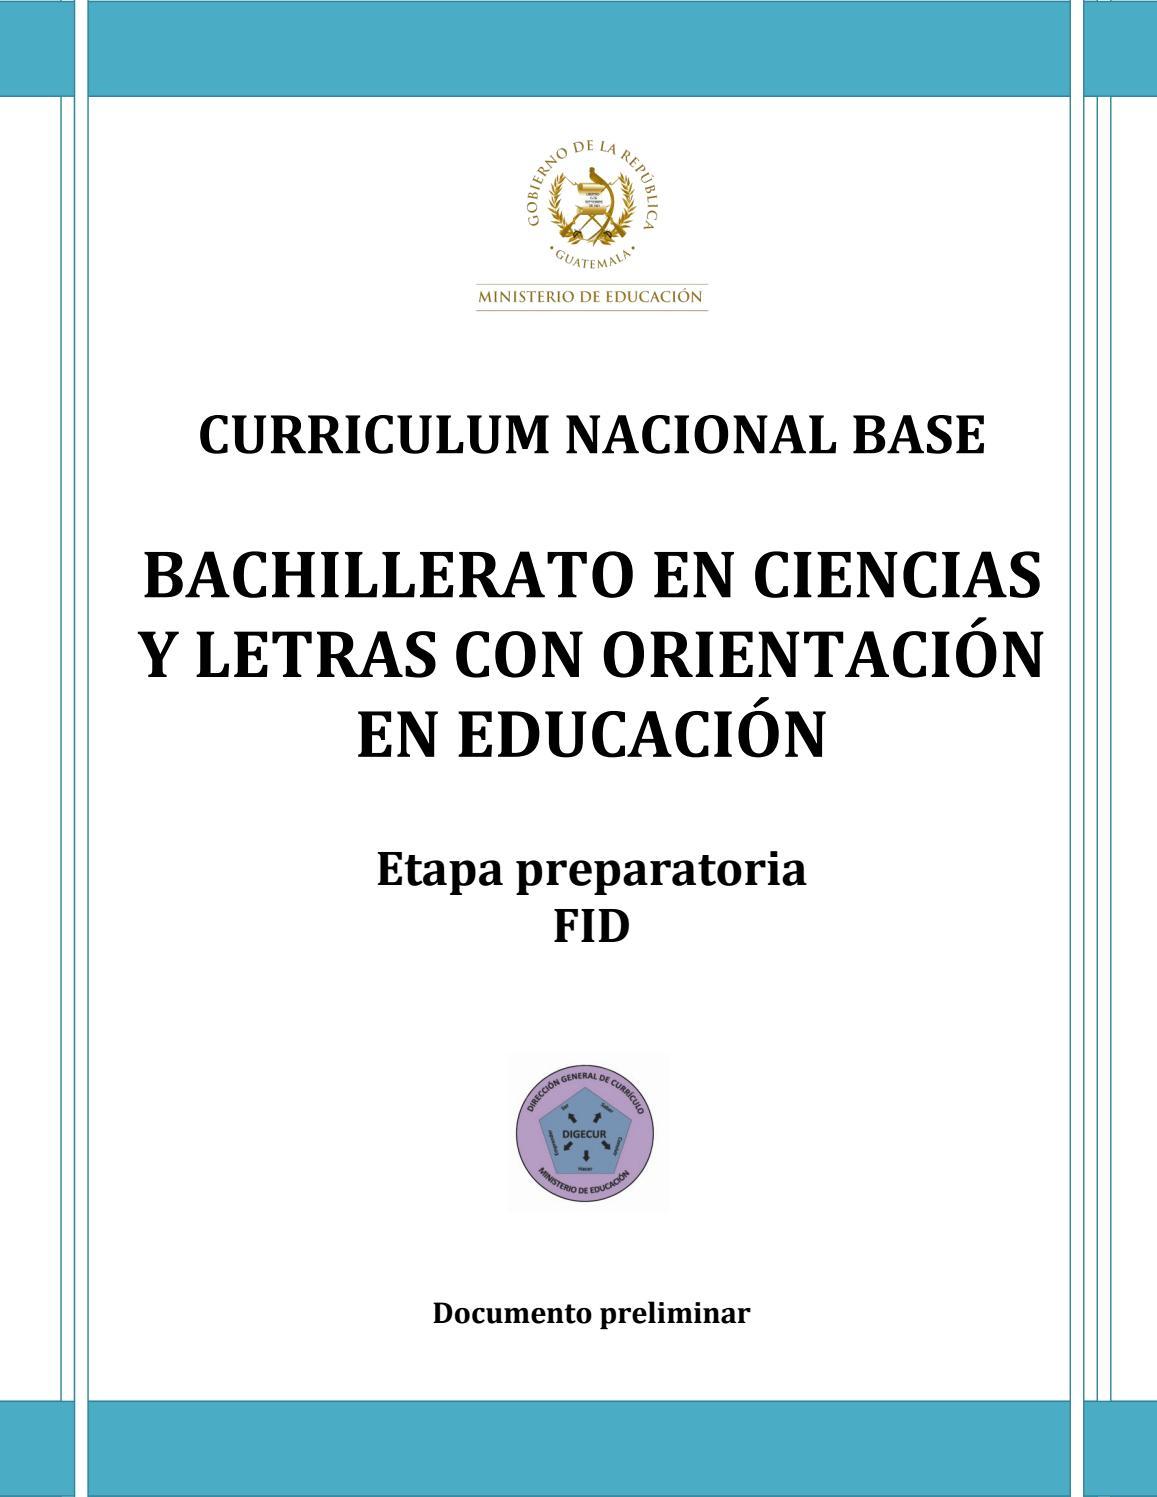 Curriculum nacional base bachillerato en ciencias y letras con ...